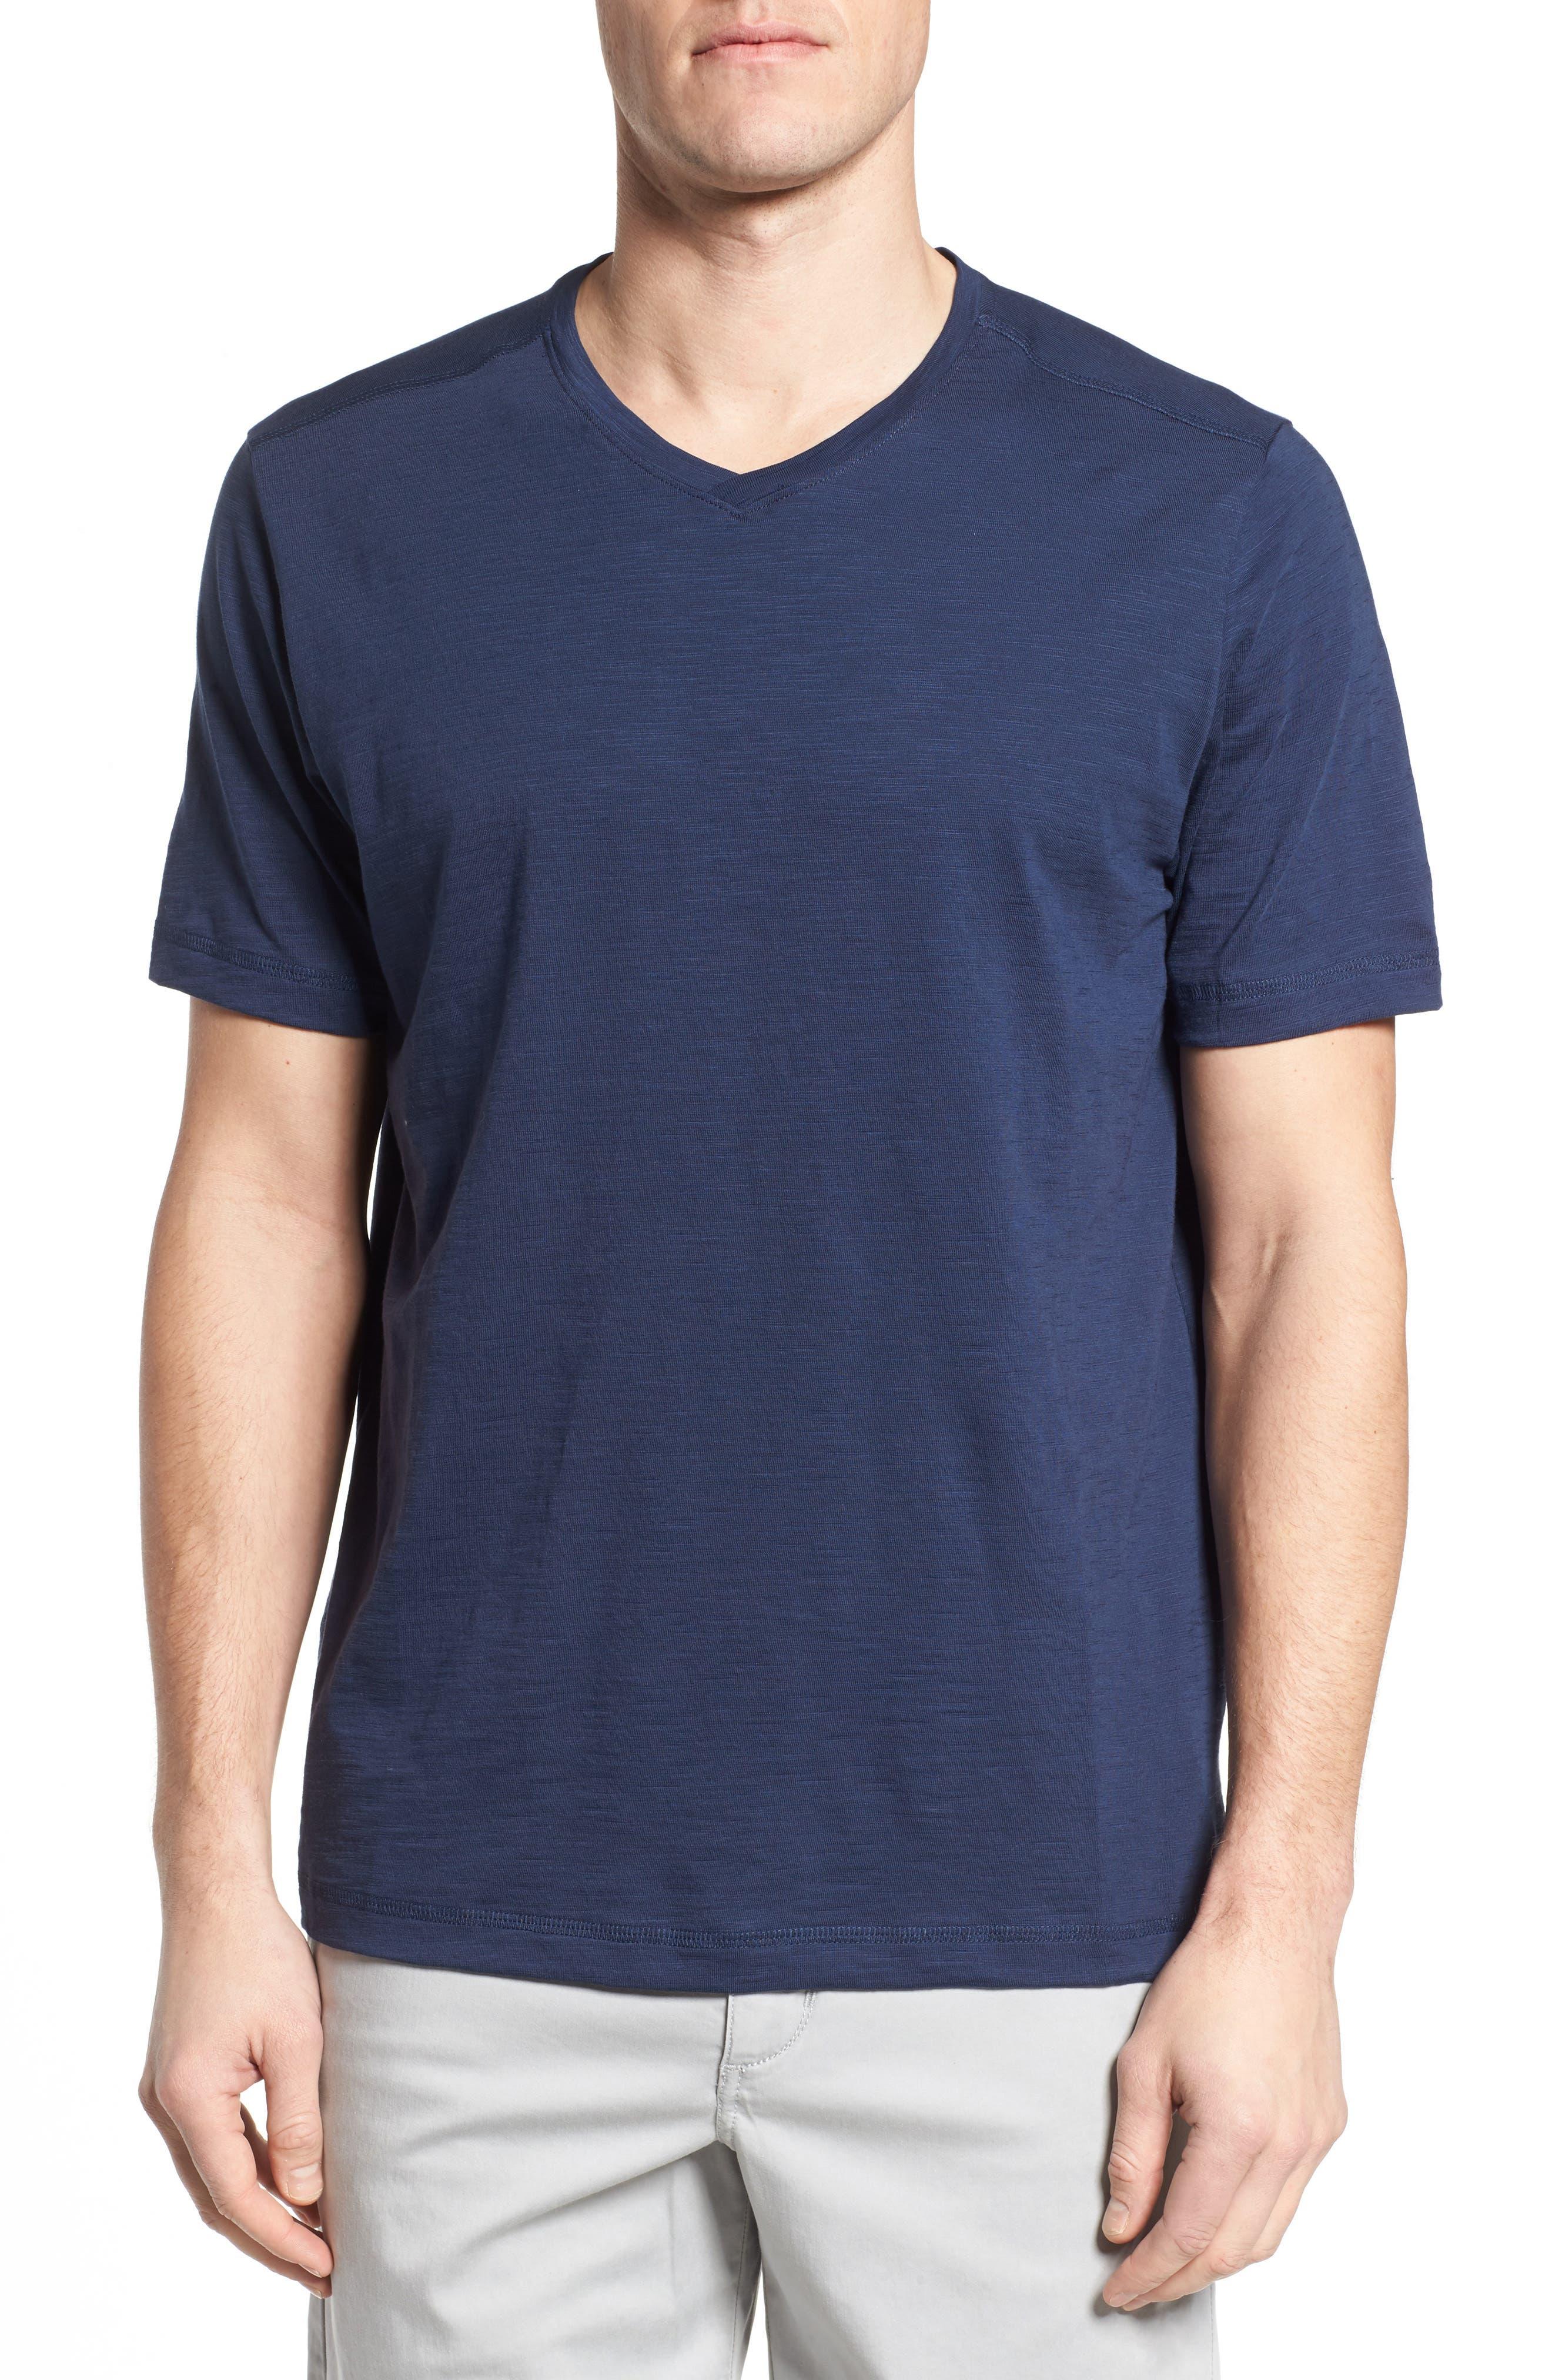 Tommy Bahama Portside Palms T-Shirt in Maritime